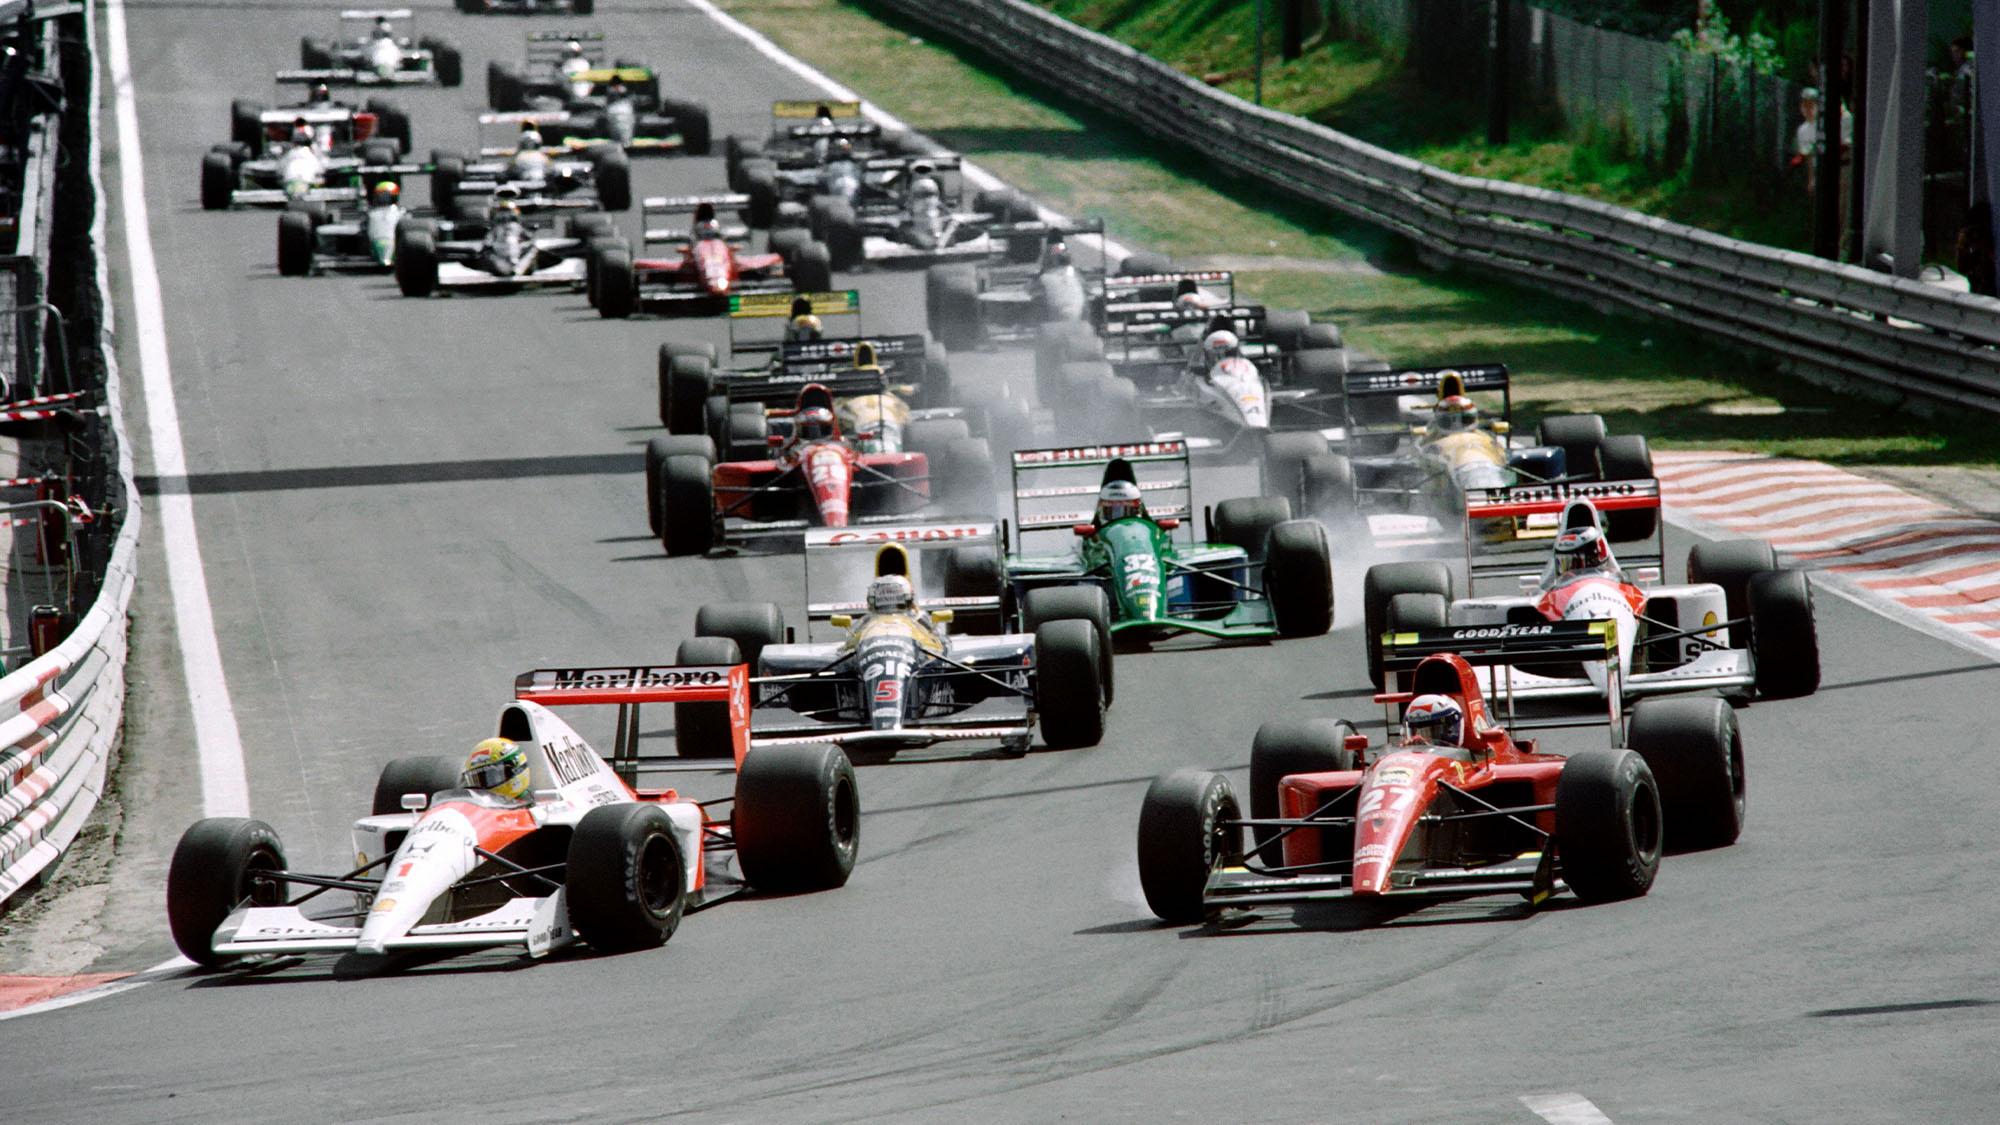 Brazilian driver Ayrton Senna, on McLaren-Honda (L) leads the pack at the